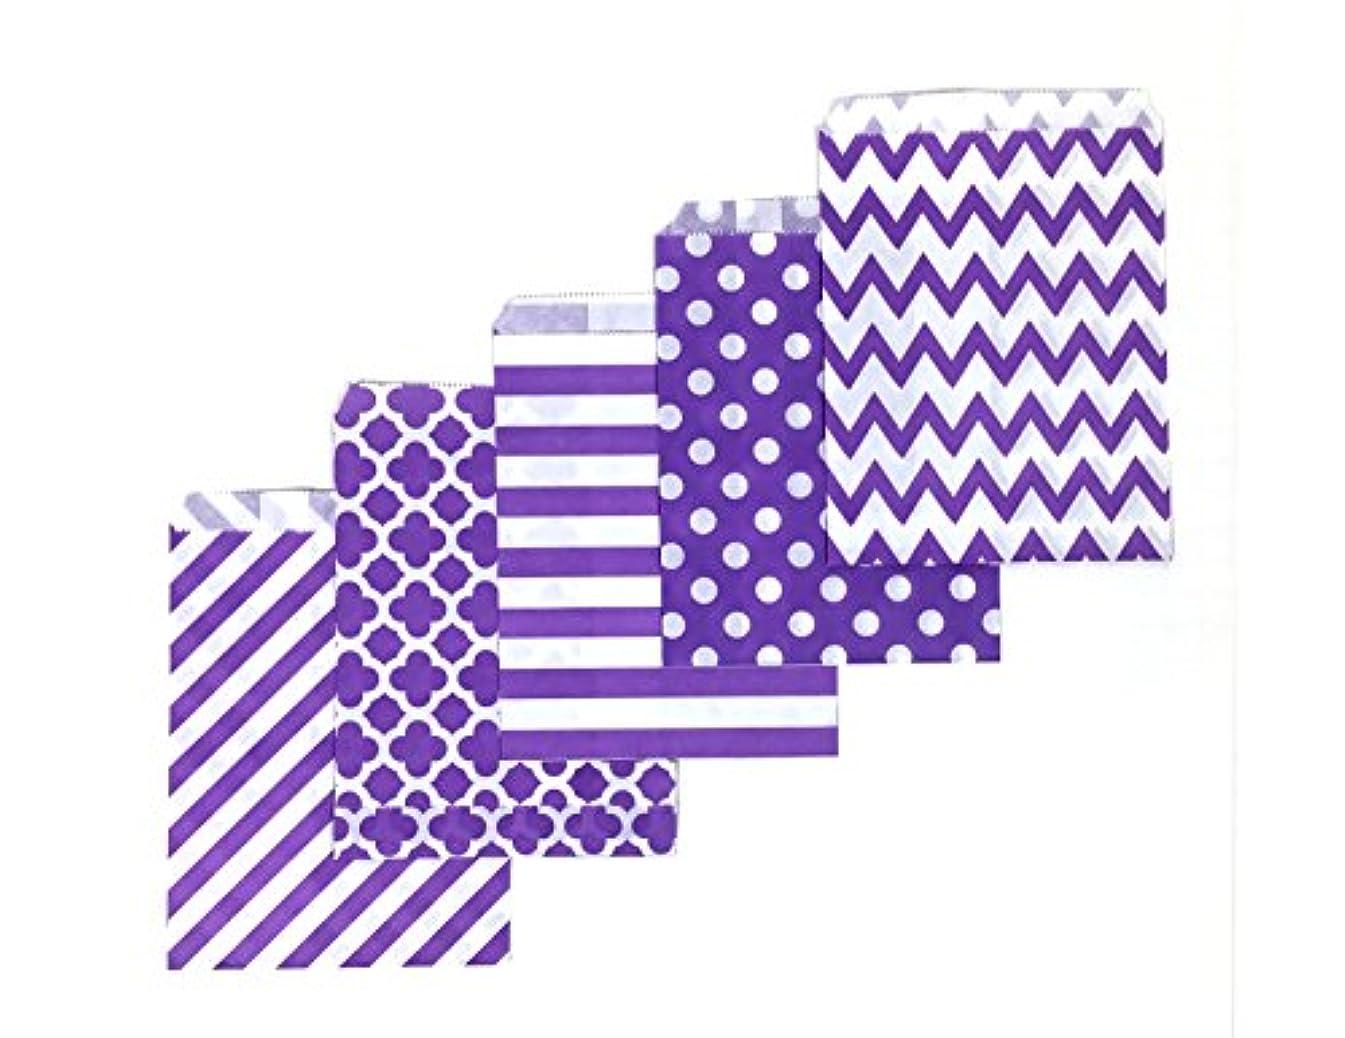 80 Counts Medium Purple Biodegradable, Food Safe Ink & Paper, Assorted 5 Designs Cookie Bag, Eco-friendly Favor Bag, Treat Bag for Party (Medium, Purple)